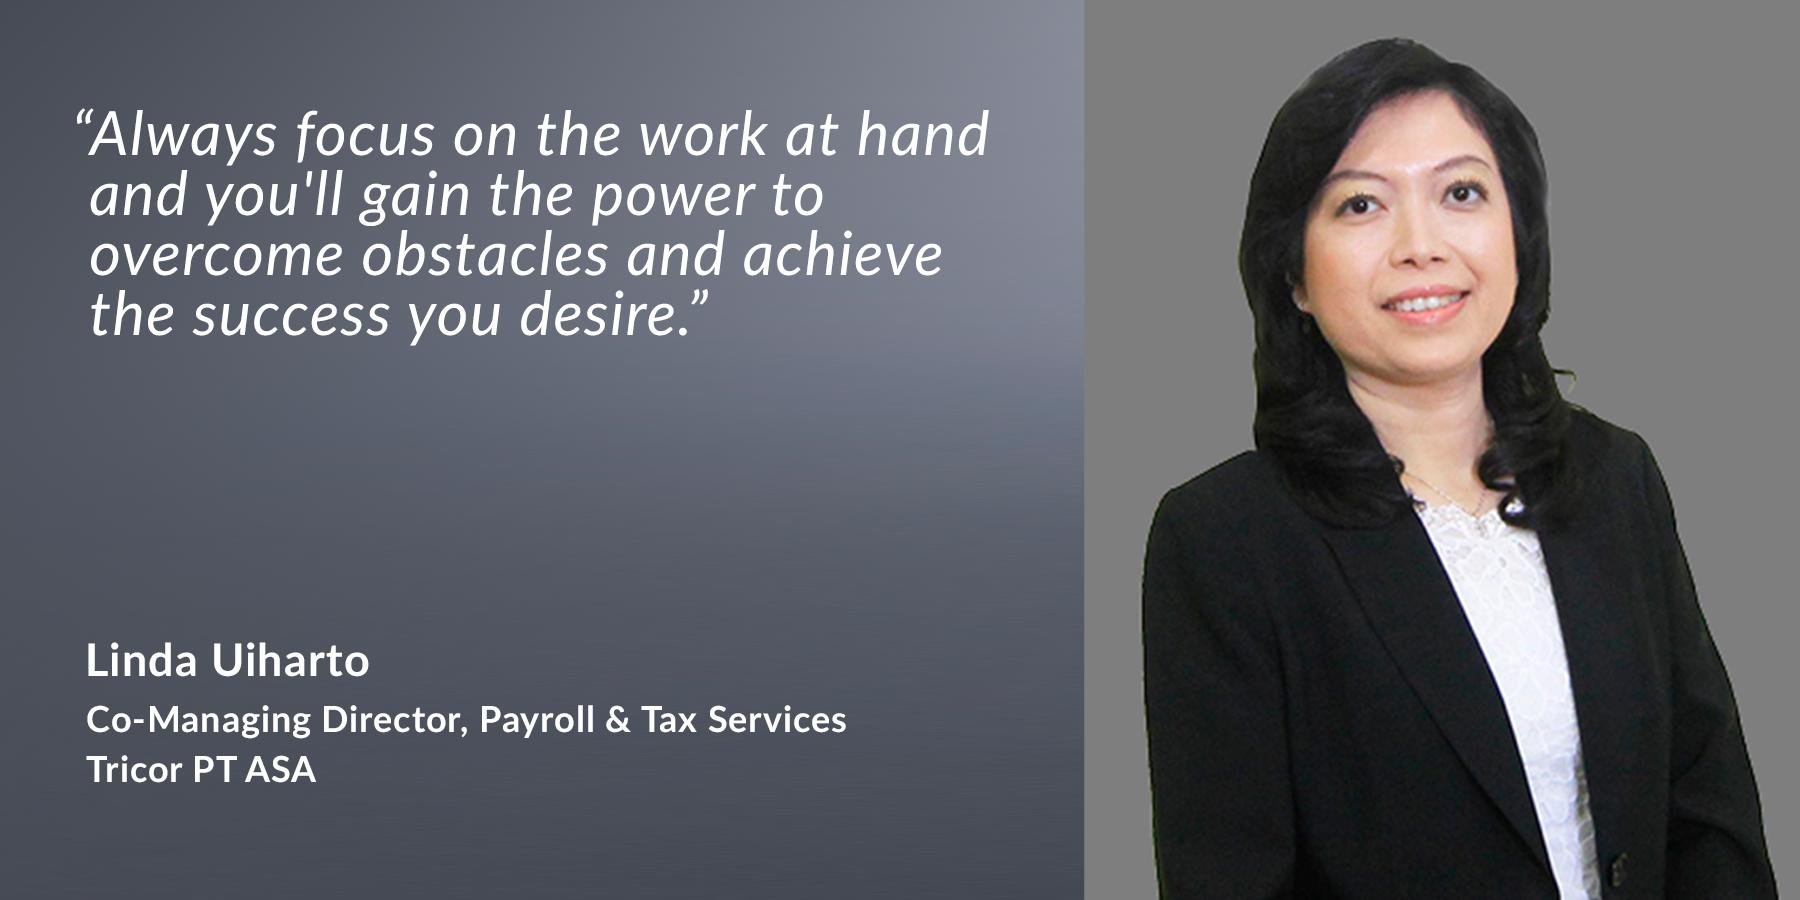 Linda Uiharto - Co-Managing Director, Payroll & Tax Services - Tricor PT ASA